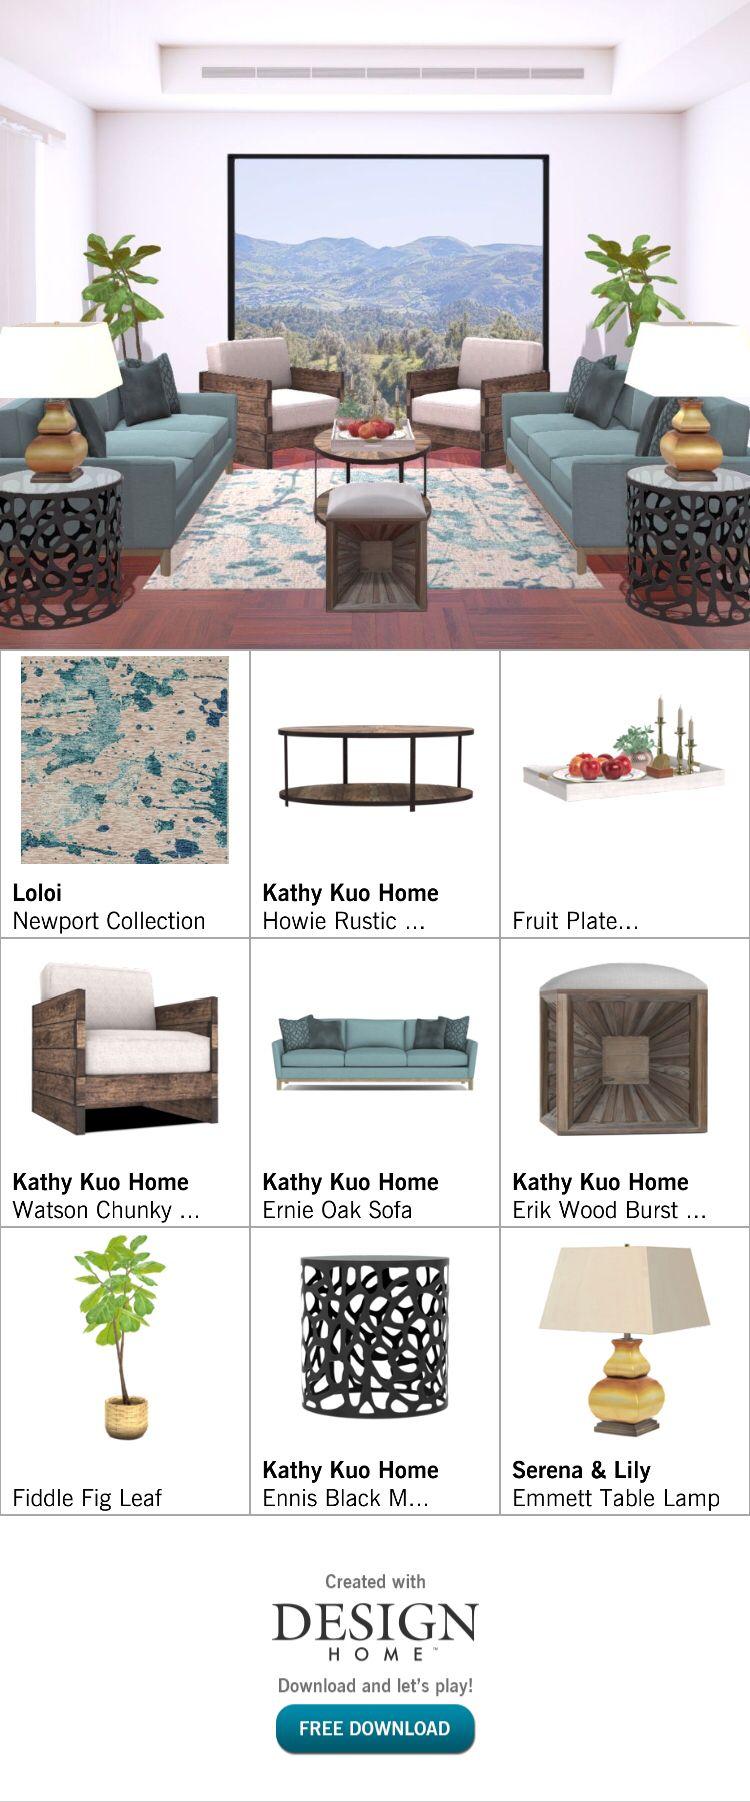 Home interior fruit plates created with design home  debbieus designs  pinterest